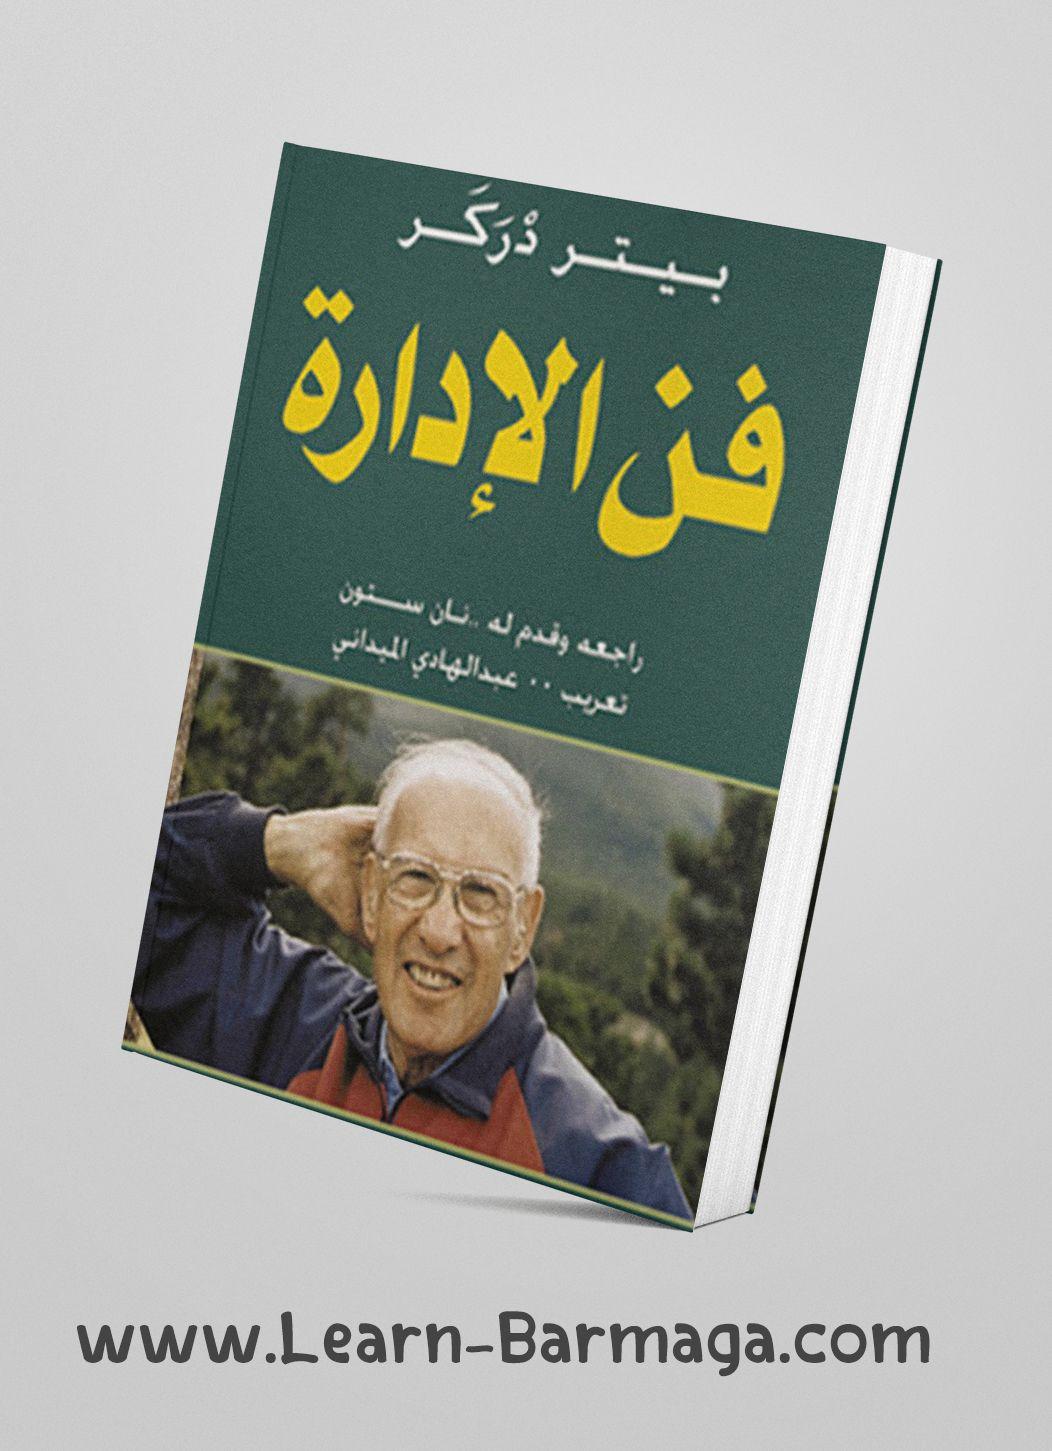 كتاب فن الإدارة بيتر دراكر Pdf Ebooks Free Books Books Pdf Books